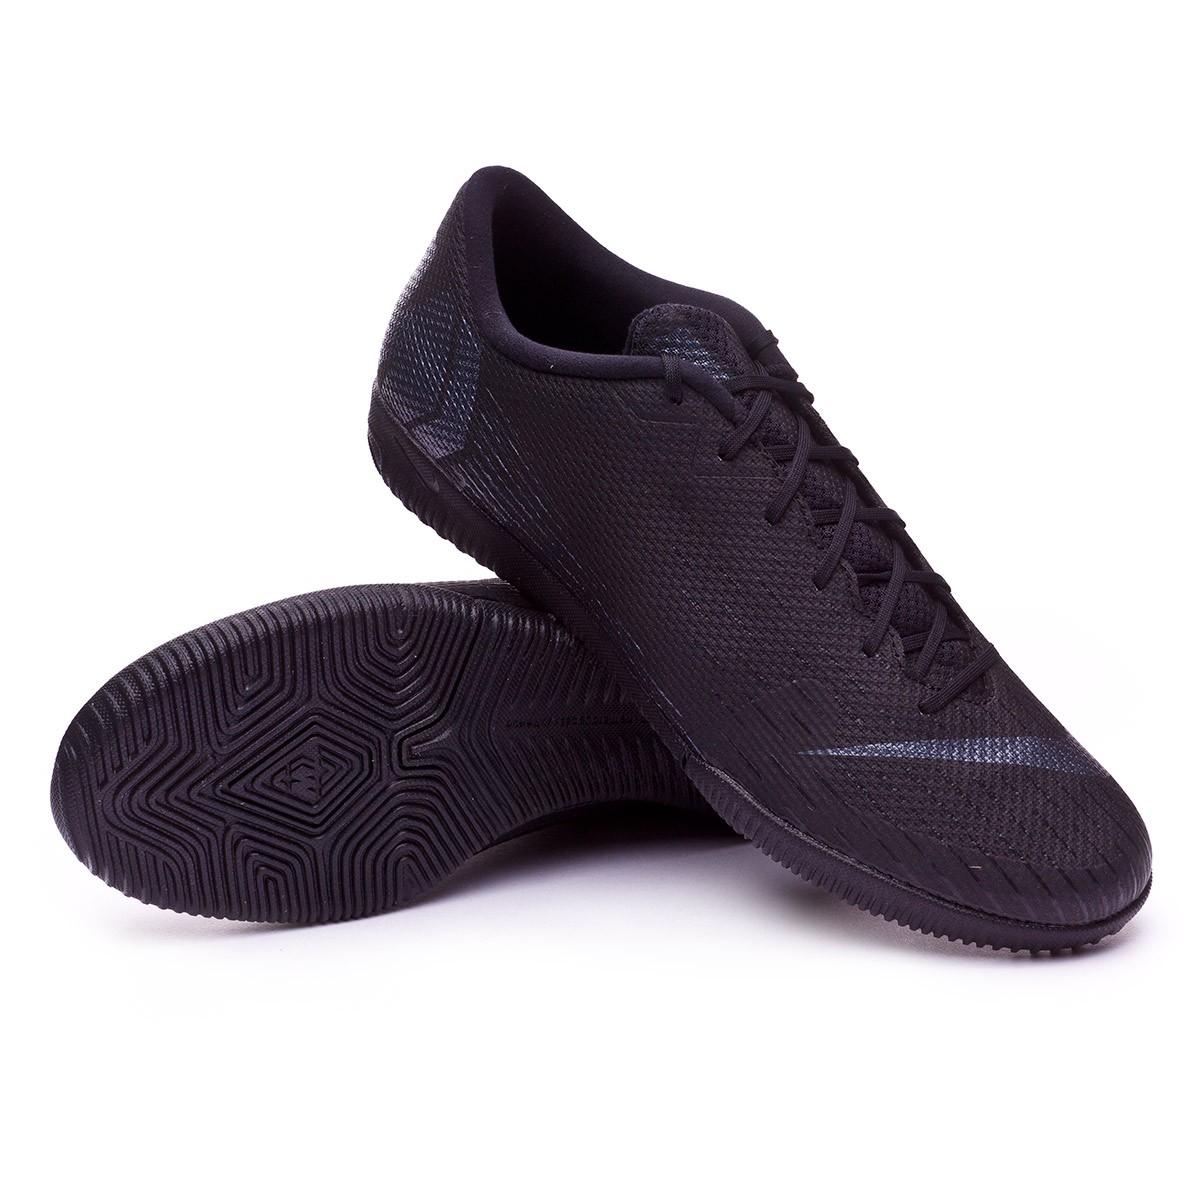 8ed30ece8b8a Futsal Boot Nike Mercurial Vapor XII Academy IC Black - Football ...